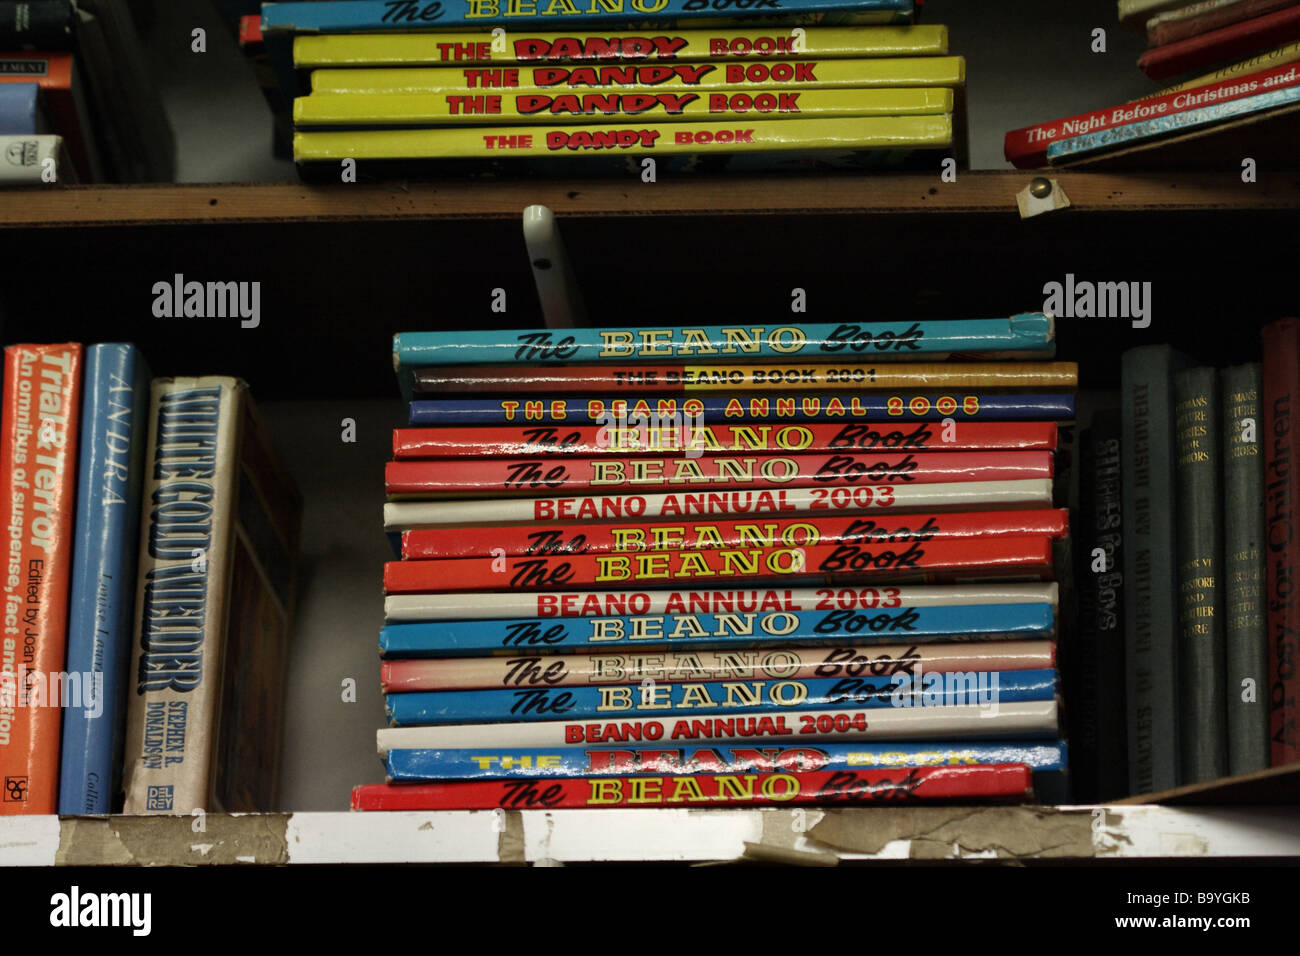 A Stack Of Books On Bookshelf The Beano Anual